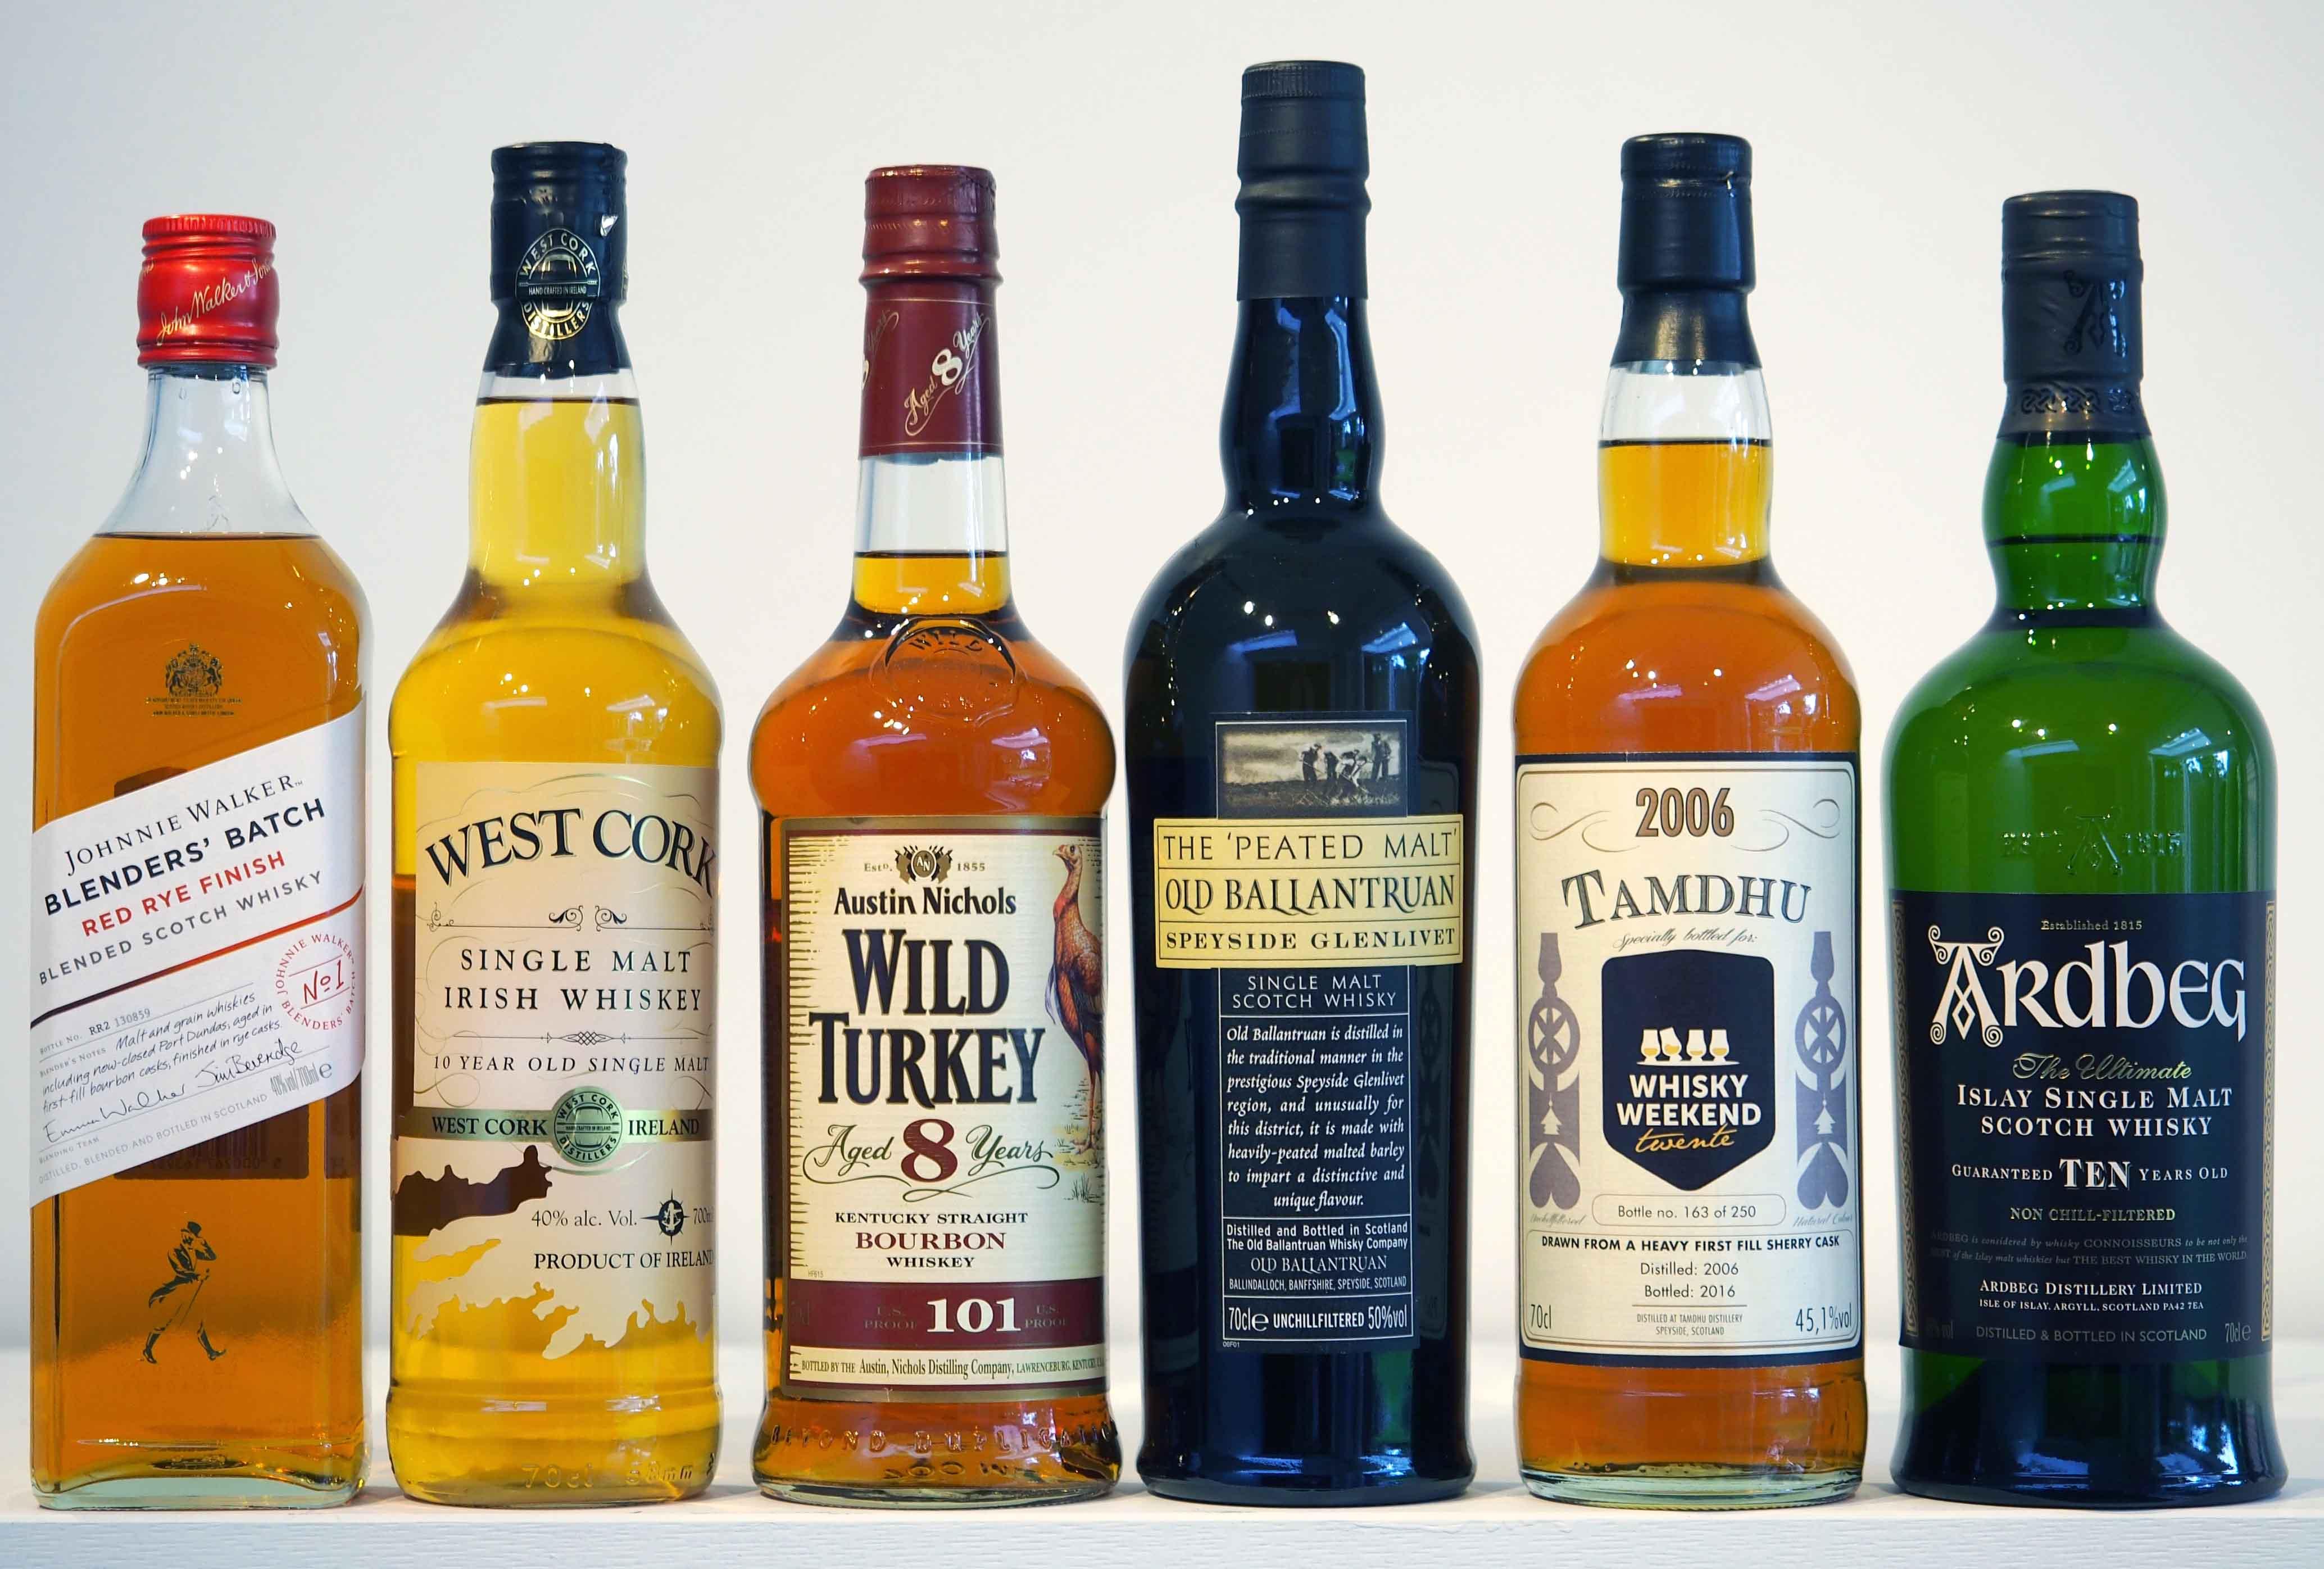 Henri Goossen whiskyproeverij feestavond themafeest whiskyverkostung whiskytasting line-up